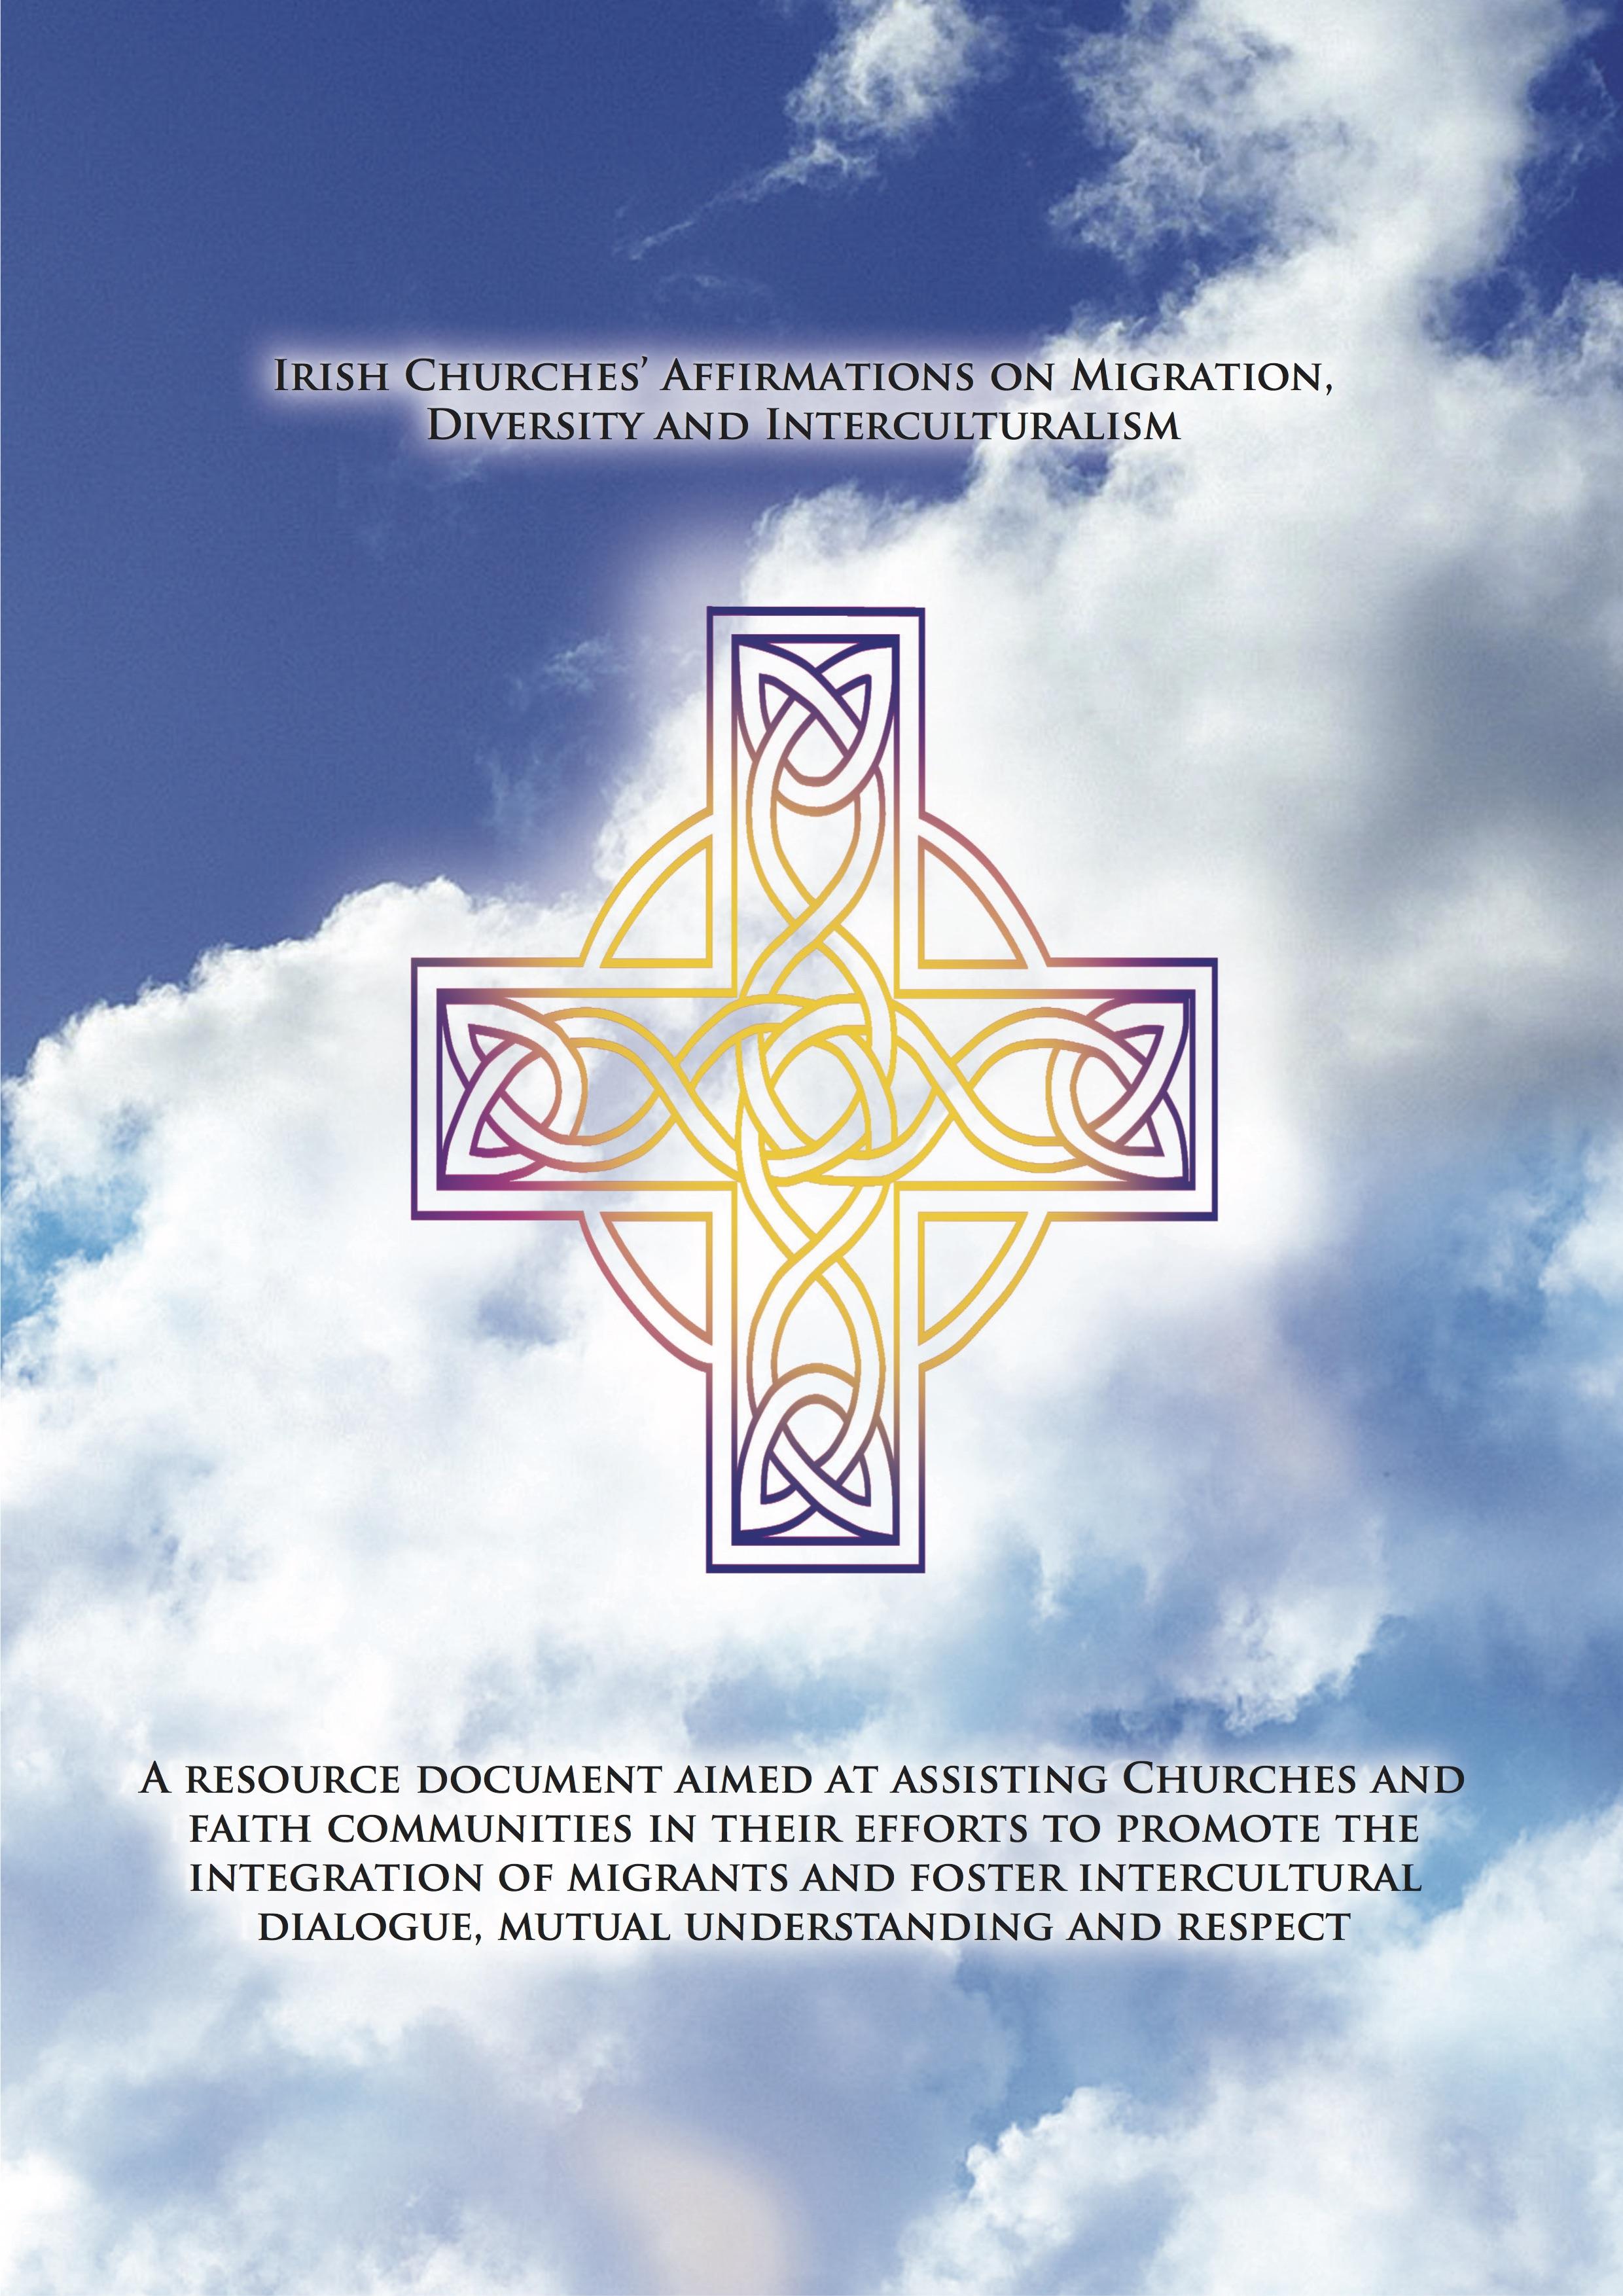 Irish Churches' 10 Affirmations on Migration, Diversity and Interculturalism